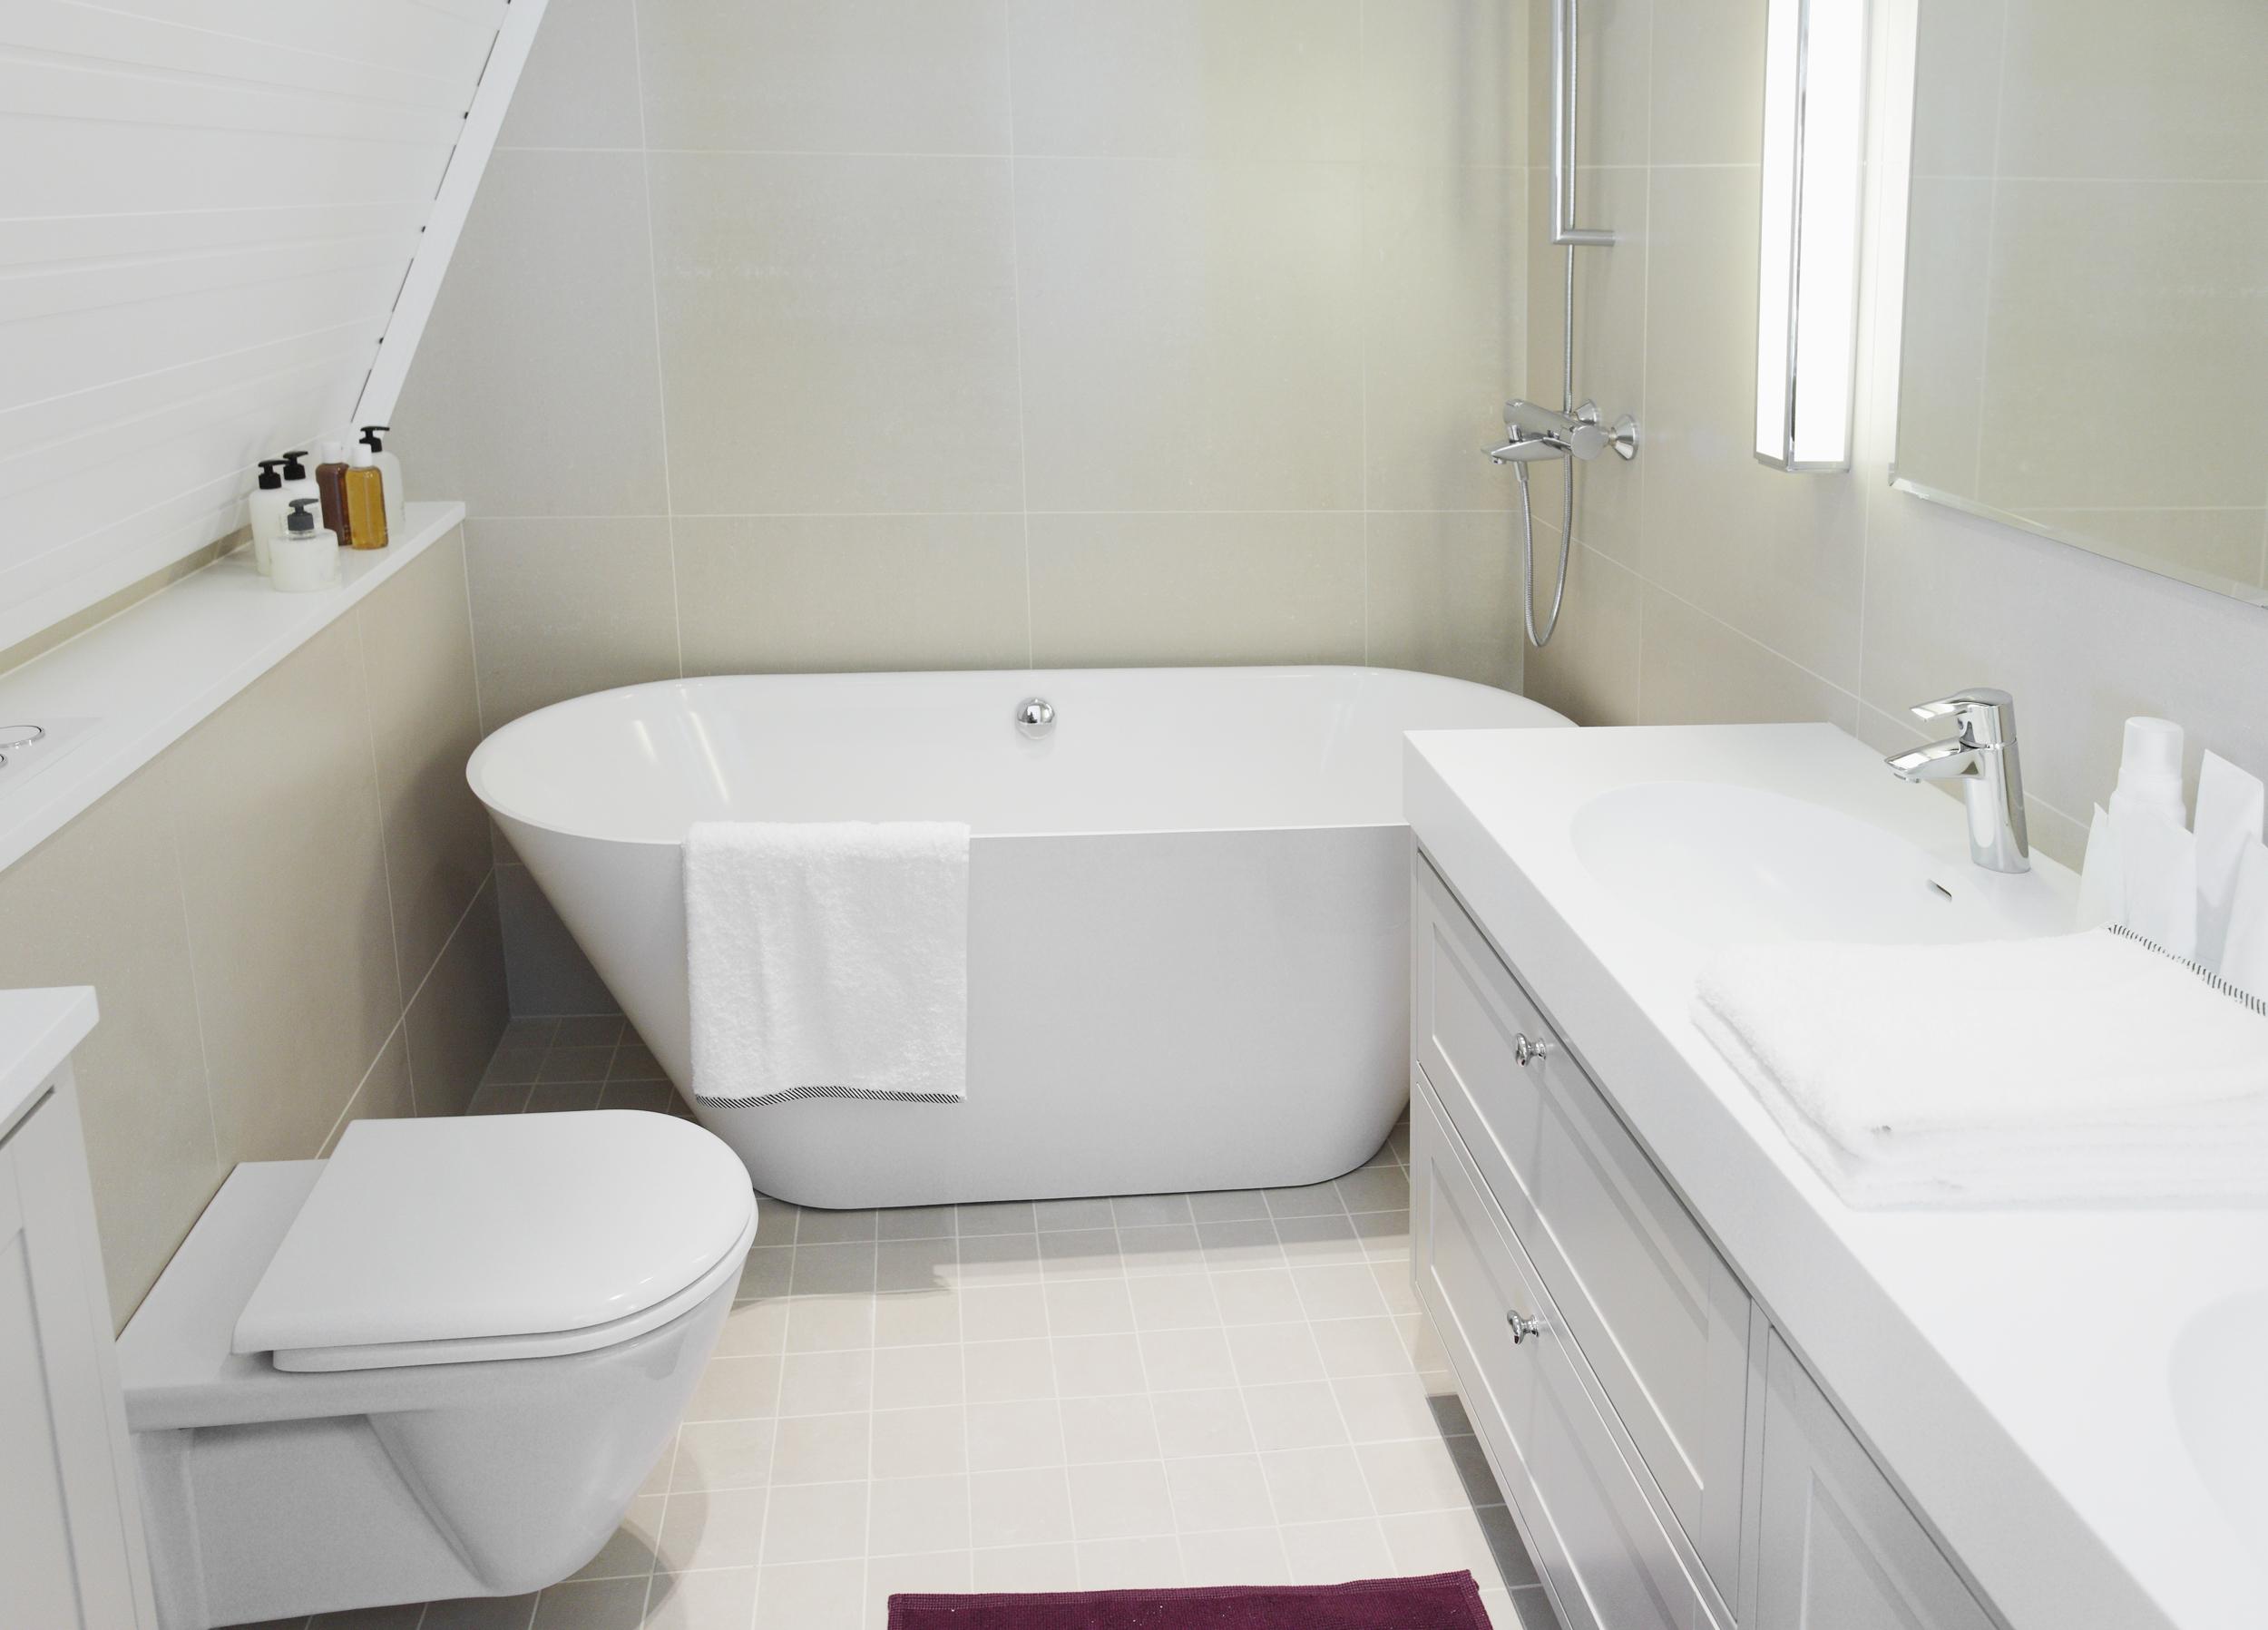 Whirlpool Kleine Badkamer : Kleine badkamer voorbeelden